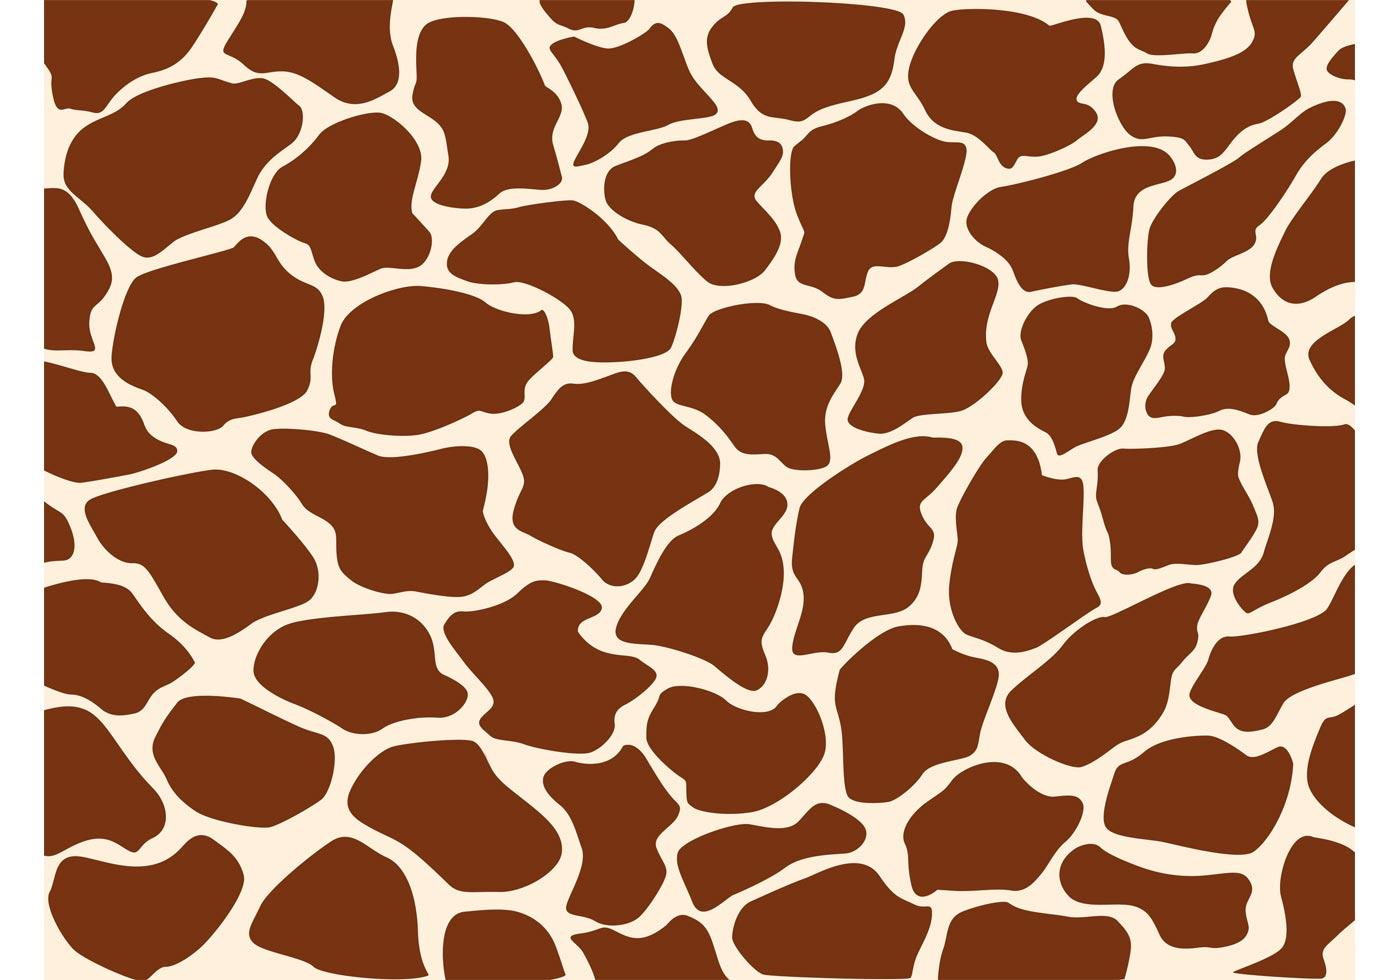 Colorful Animal Print Wallpaper Giraffe Pattern Download Free Vector Art Stock Graphics